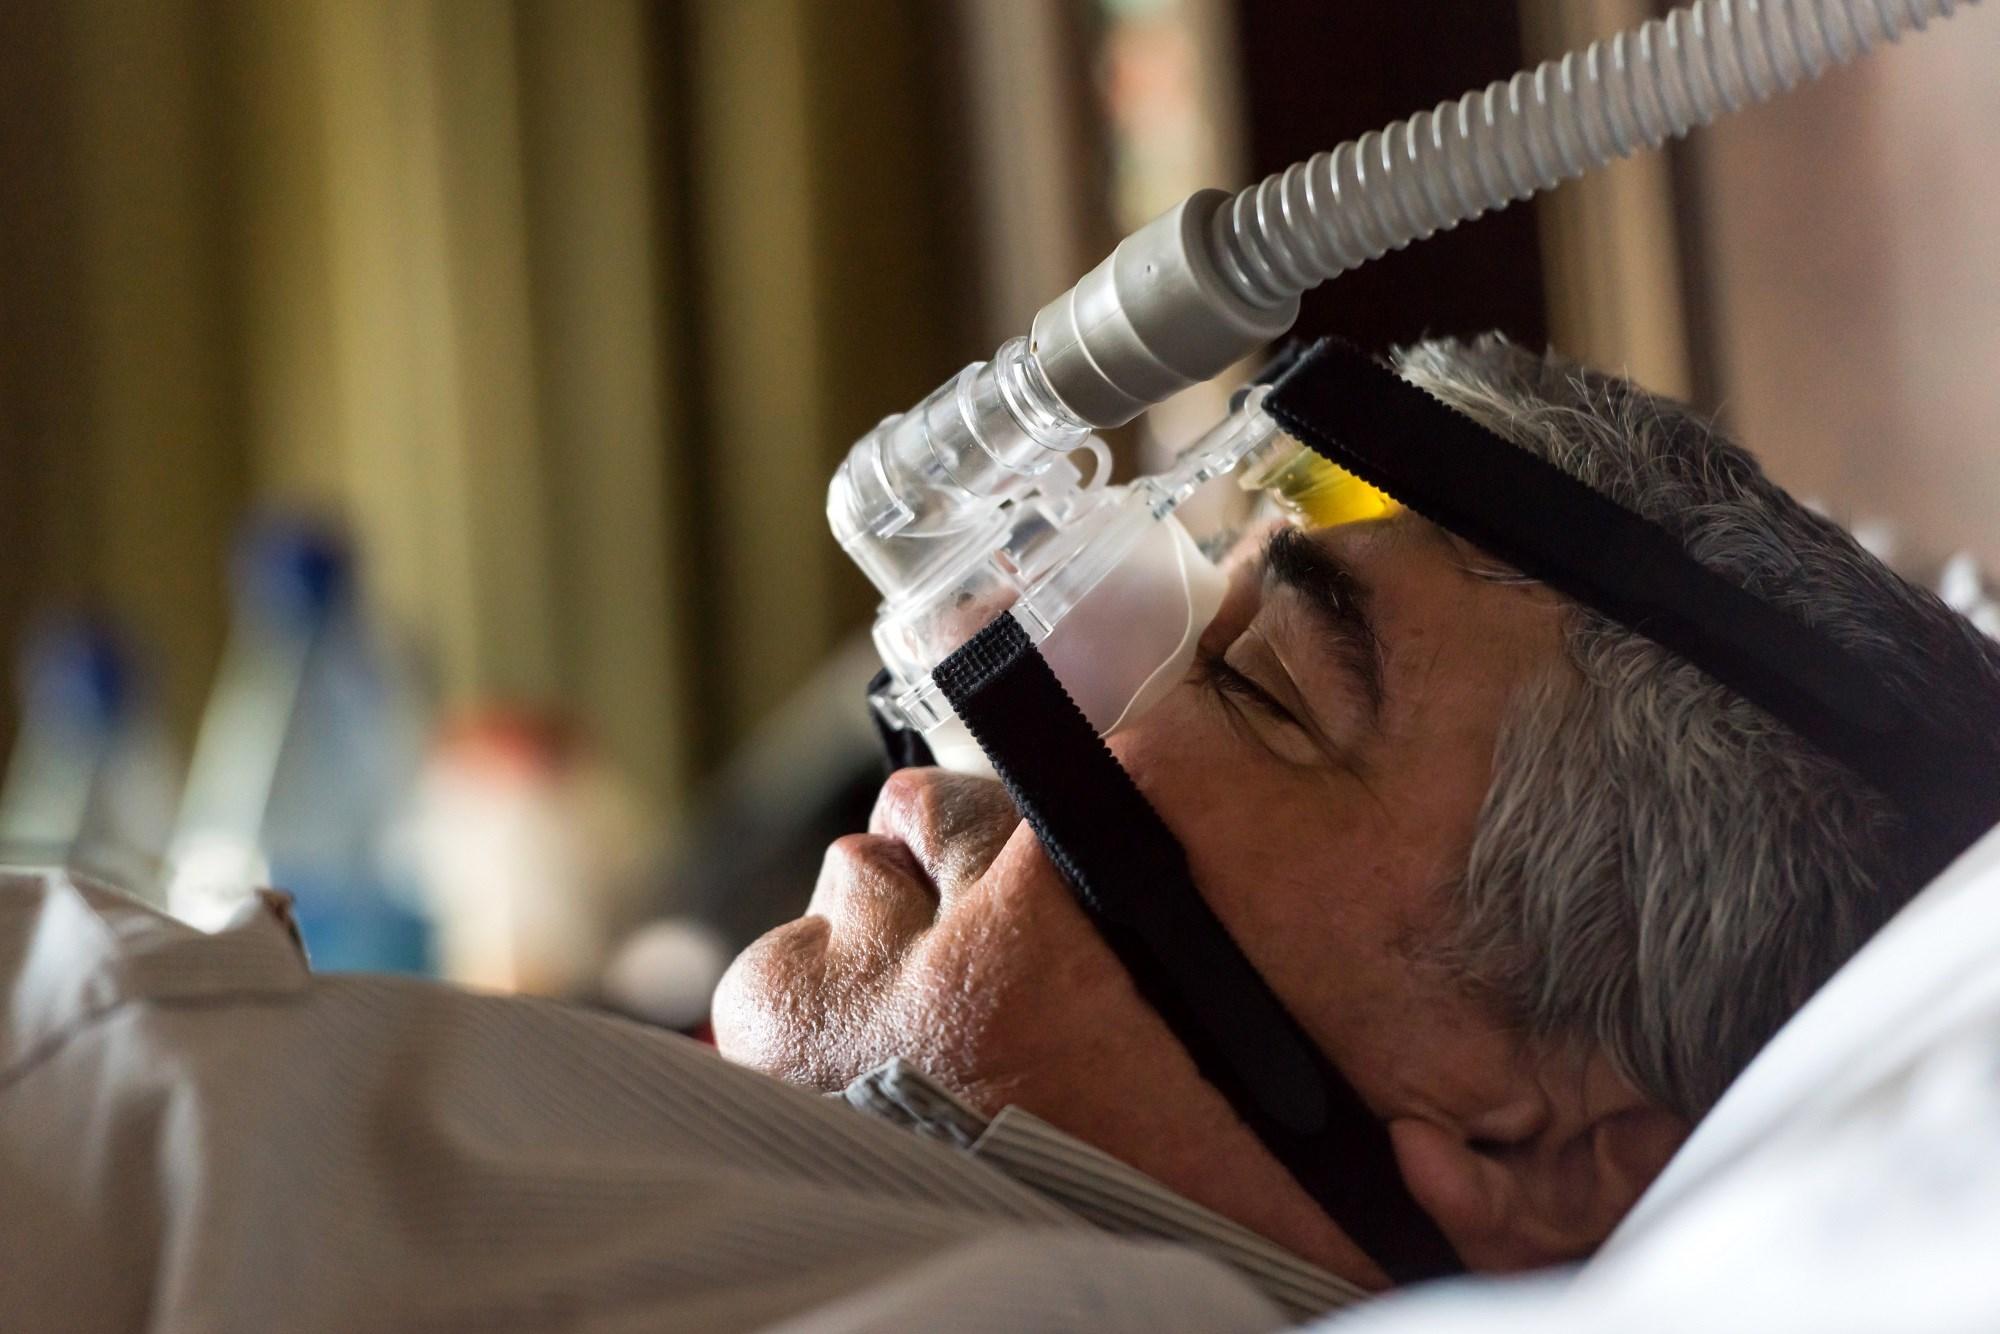 Obstructive Sleep Apnea May Increase Gout Risk